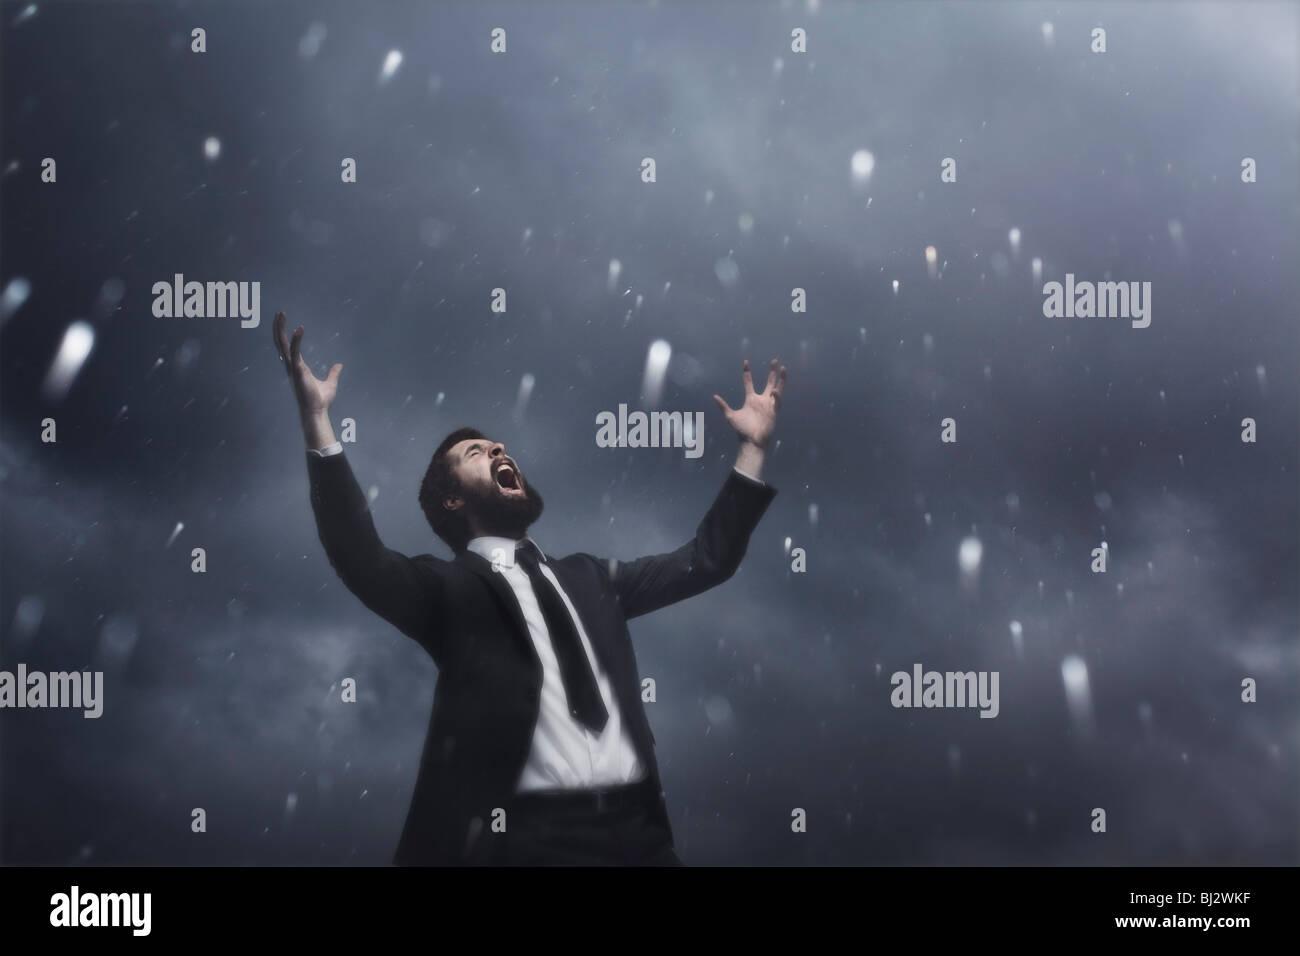 Man in the rain - Stock Image